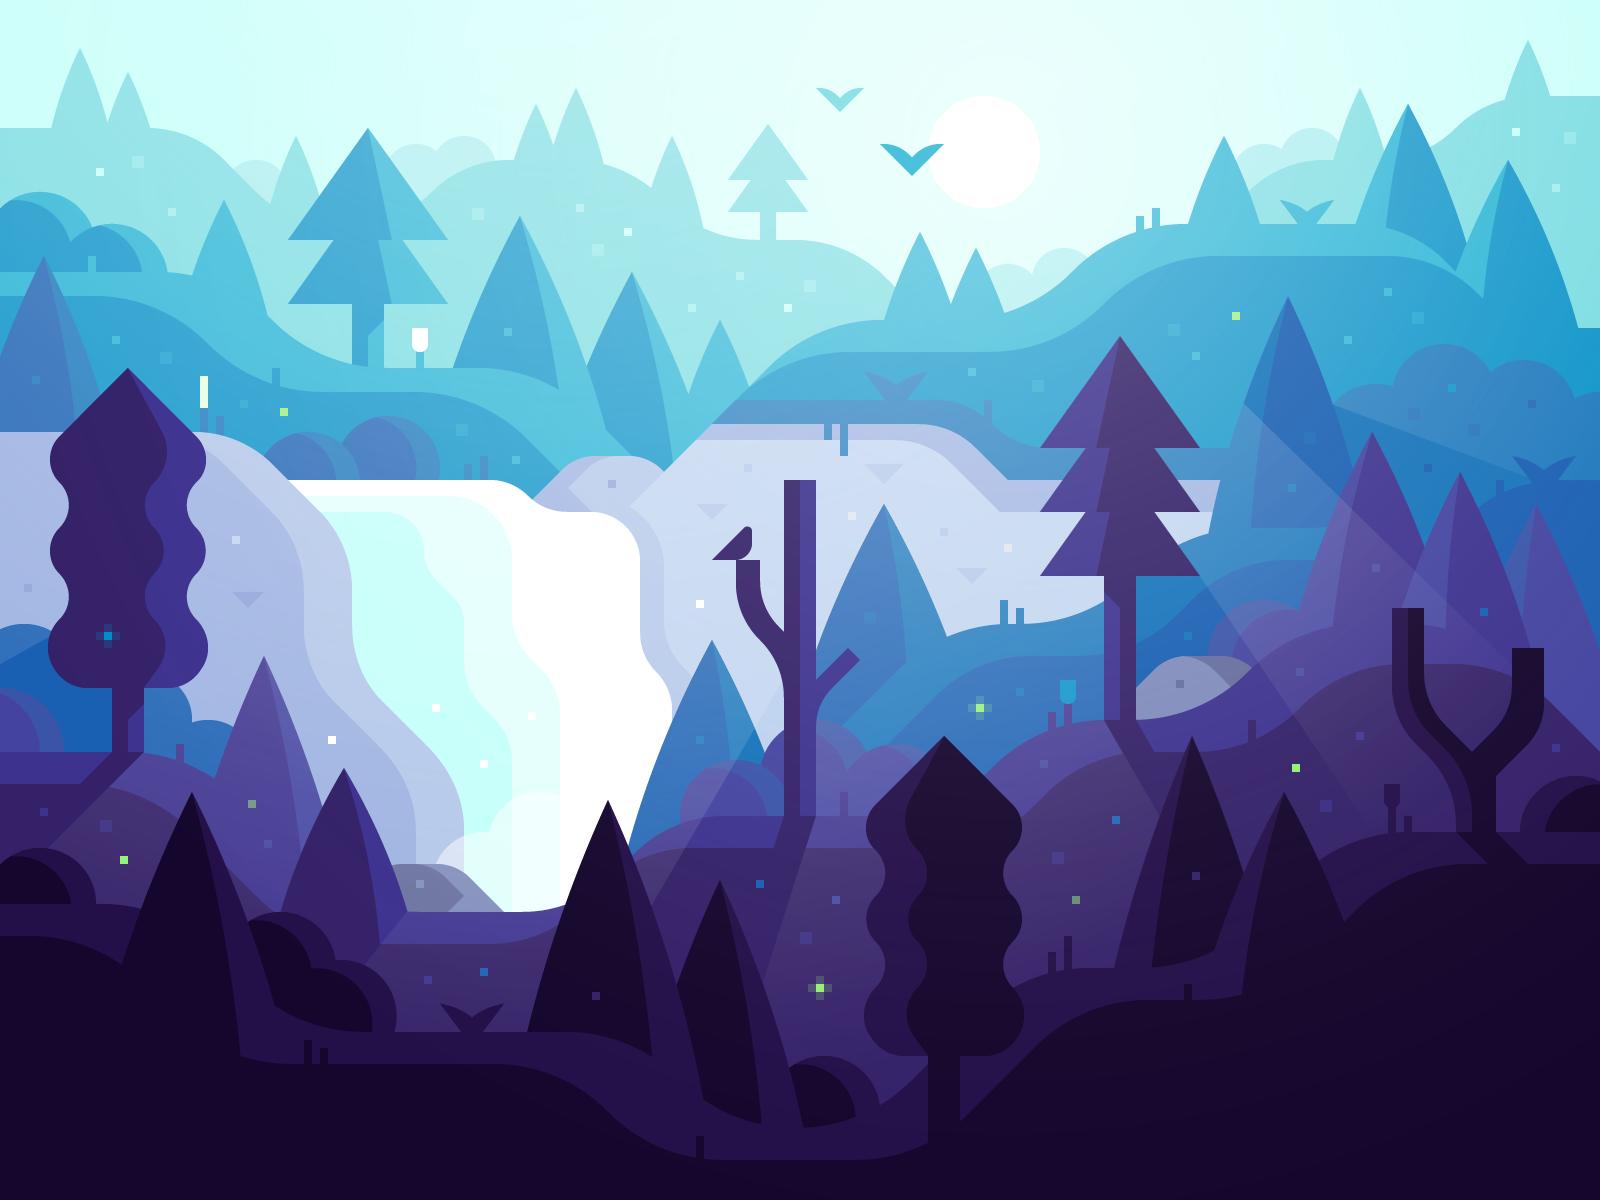 Magic Forest (v3) illustration by Alex Pasquarella